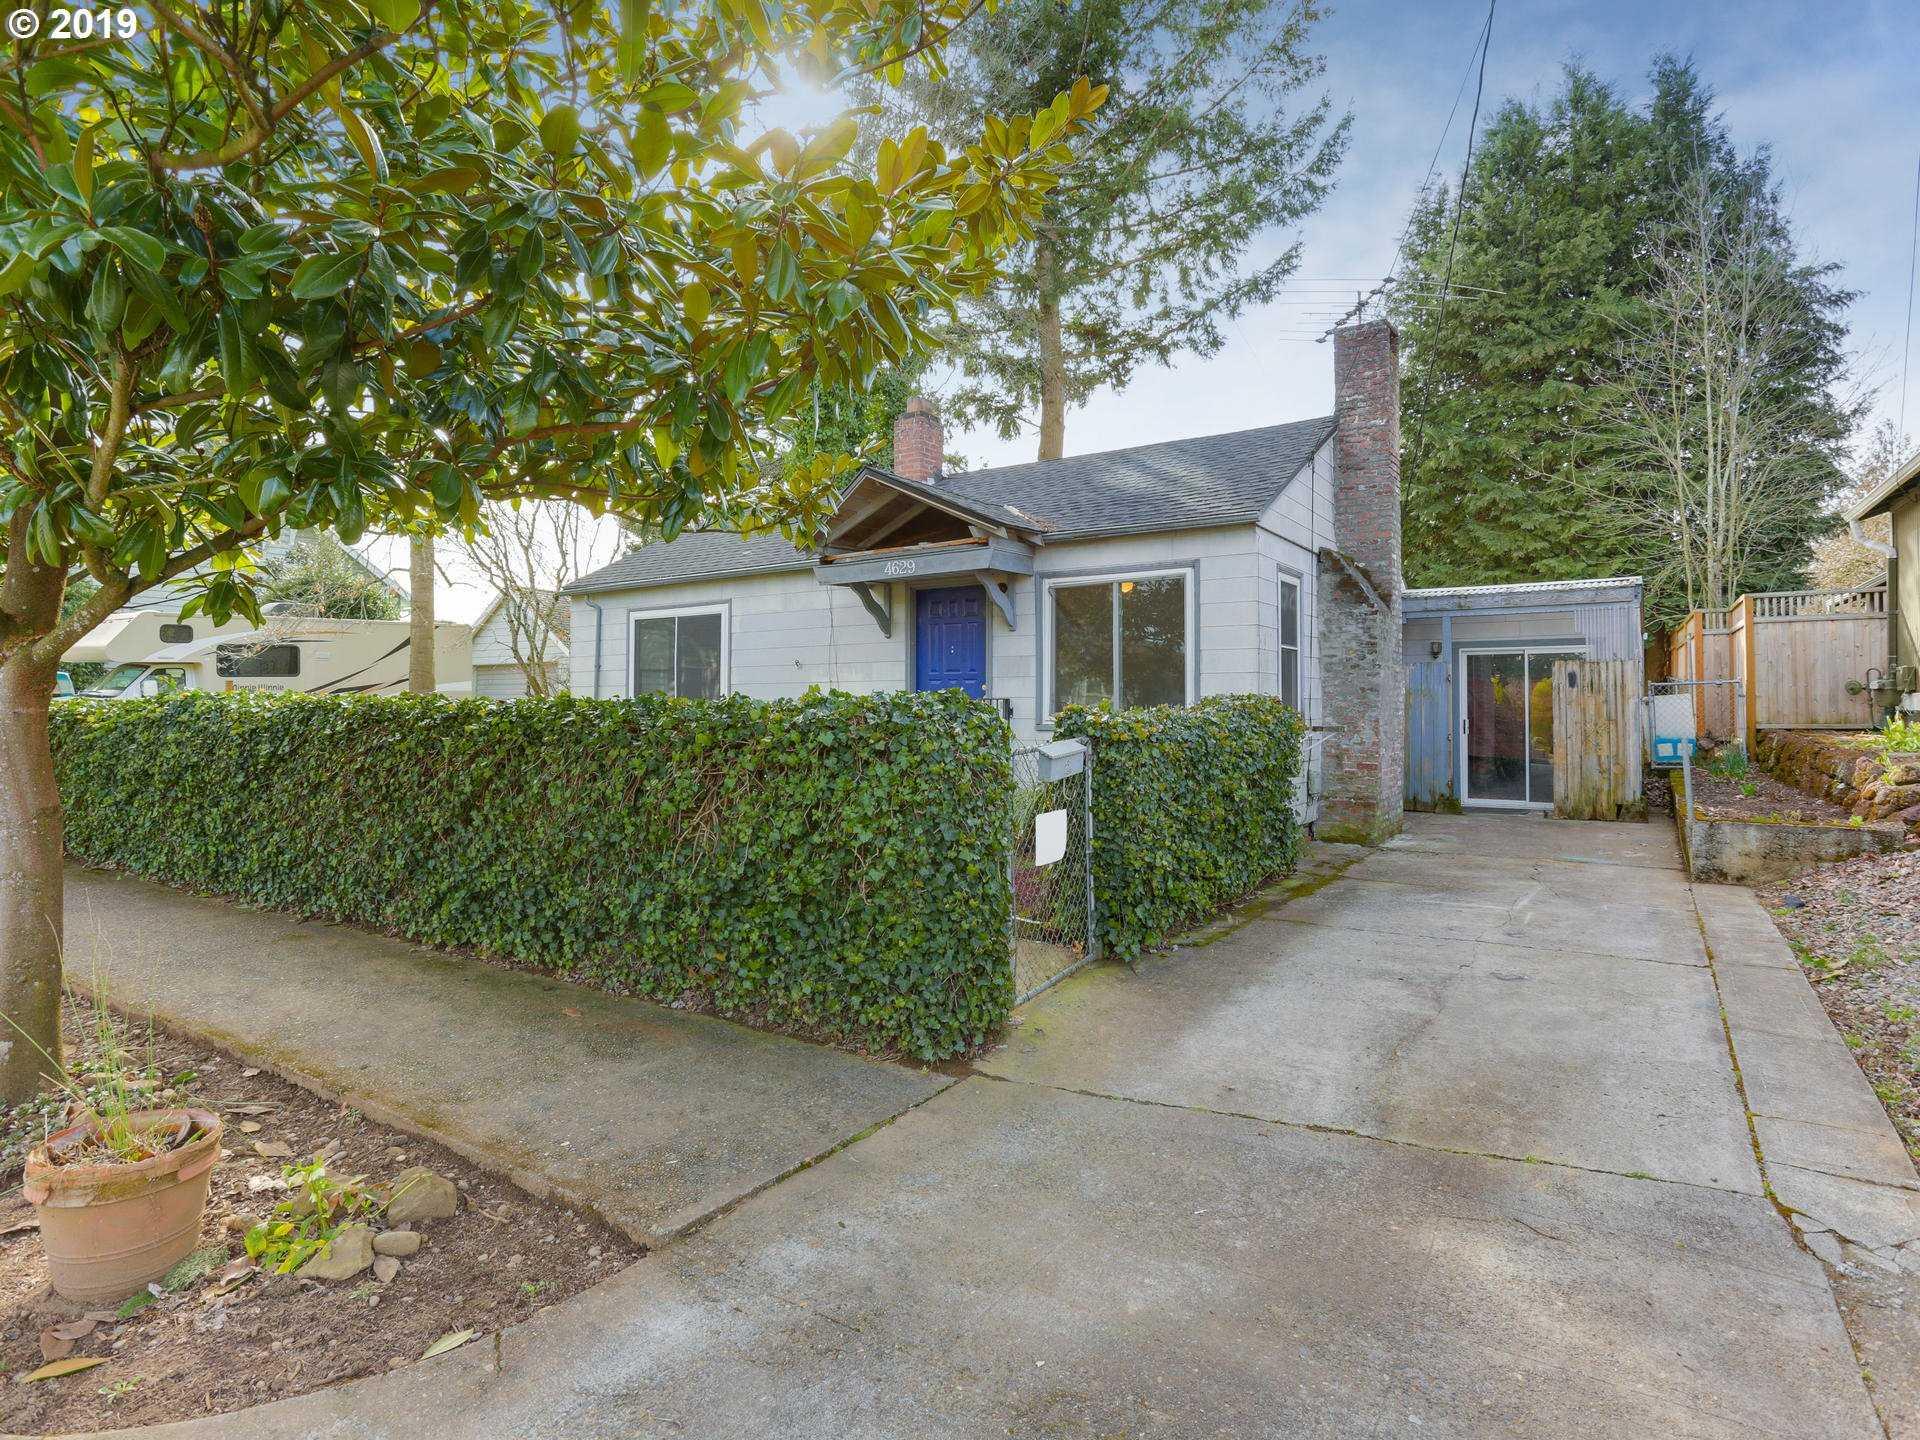 $325,000 - 2Br/1Ba -  for Sale in Creston - Kenilworth, Portland